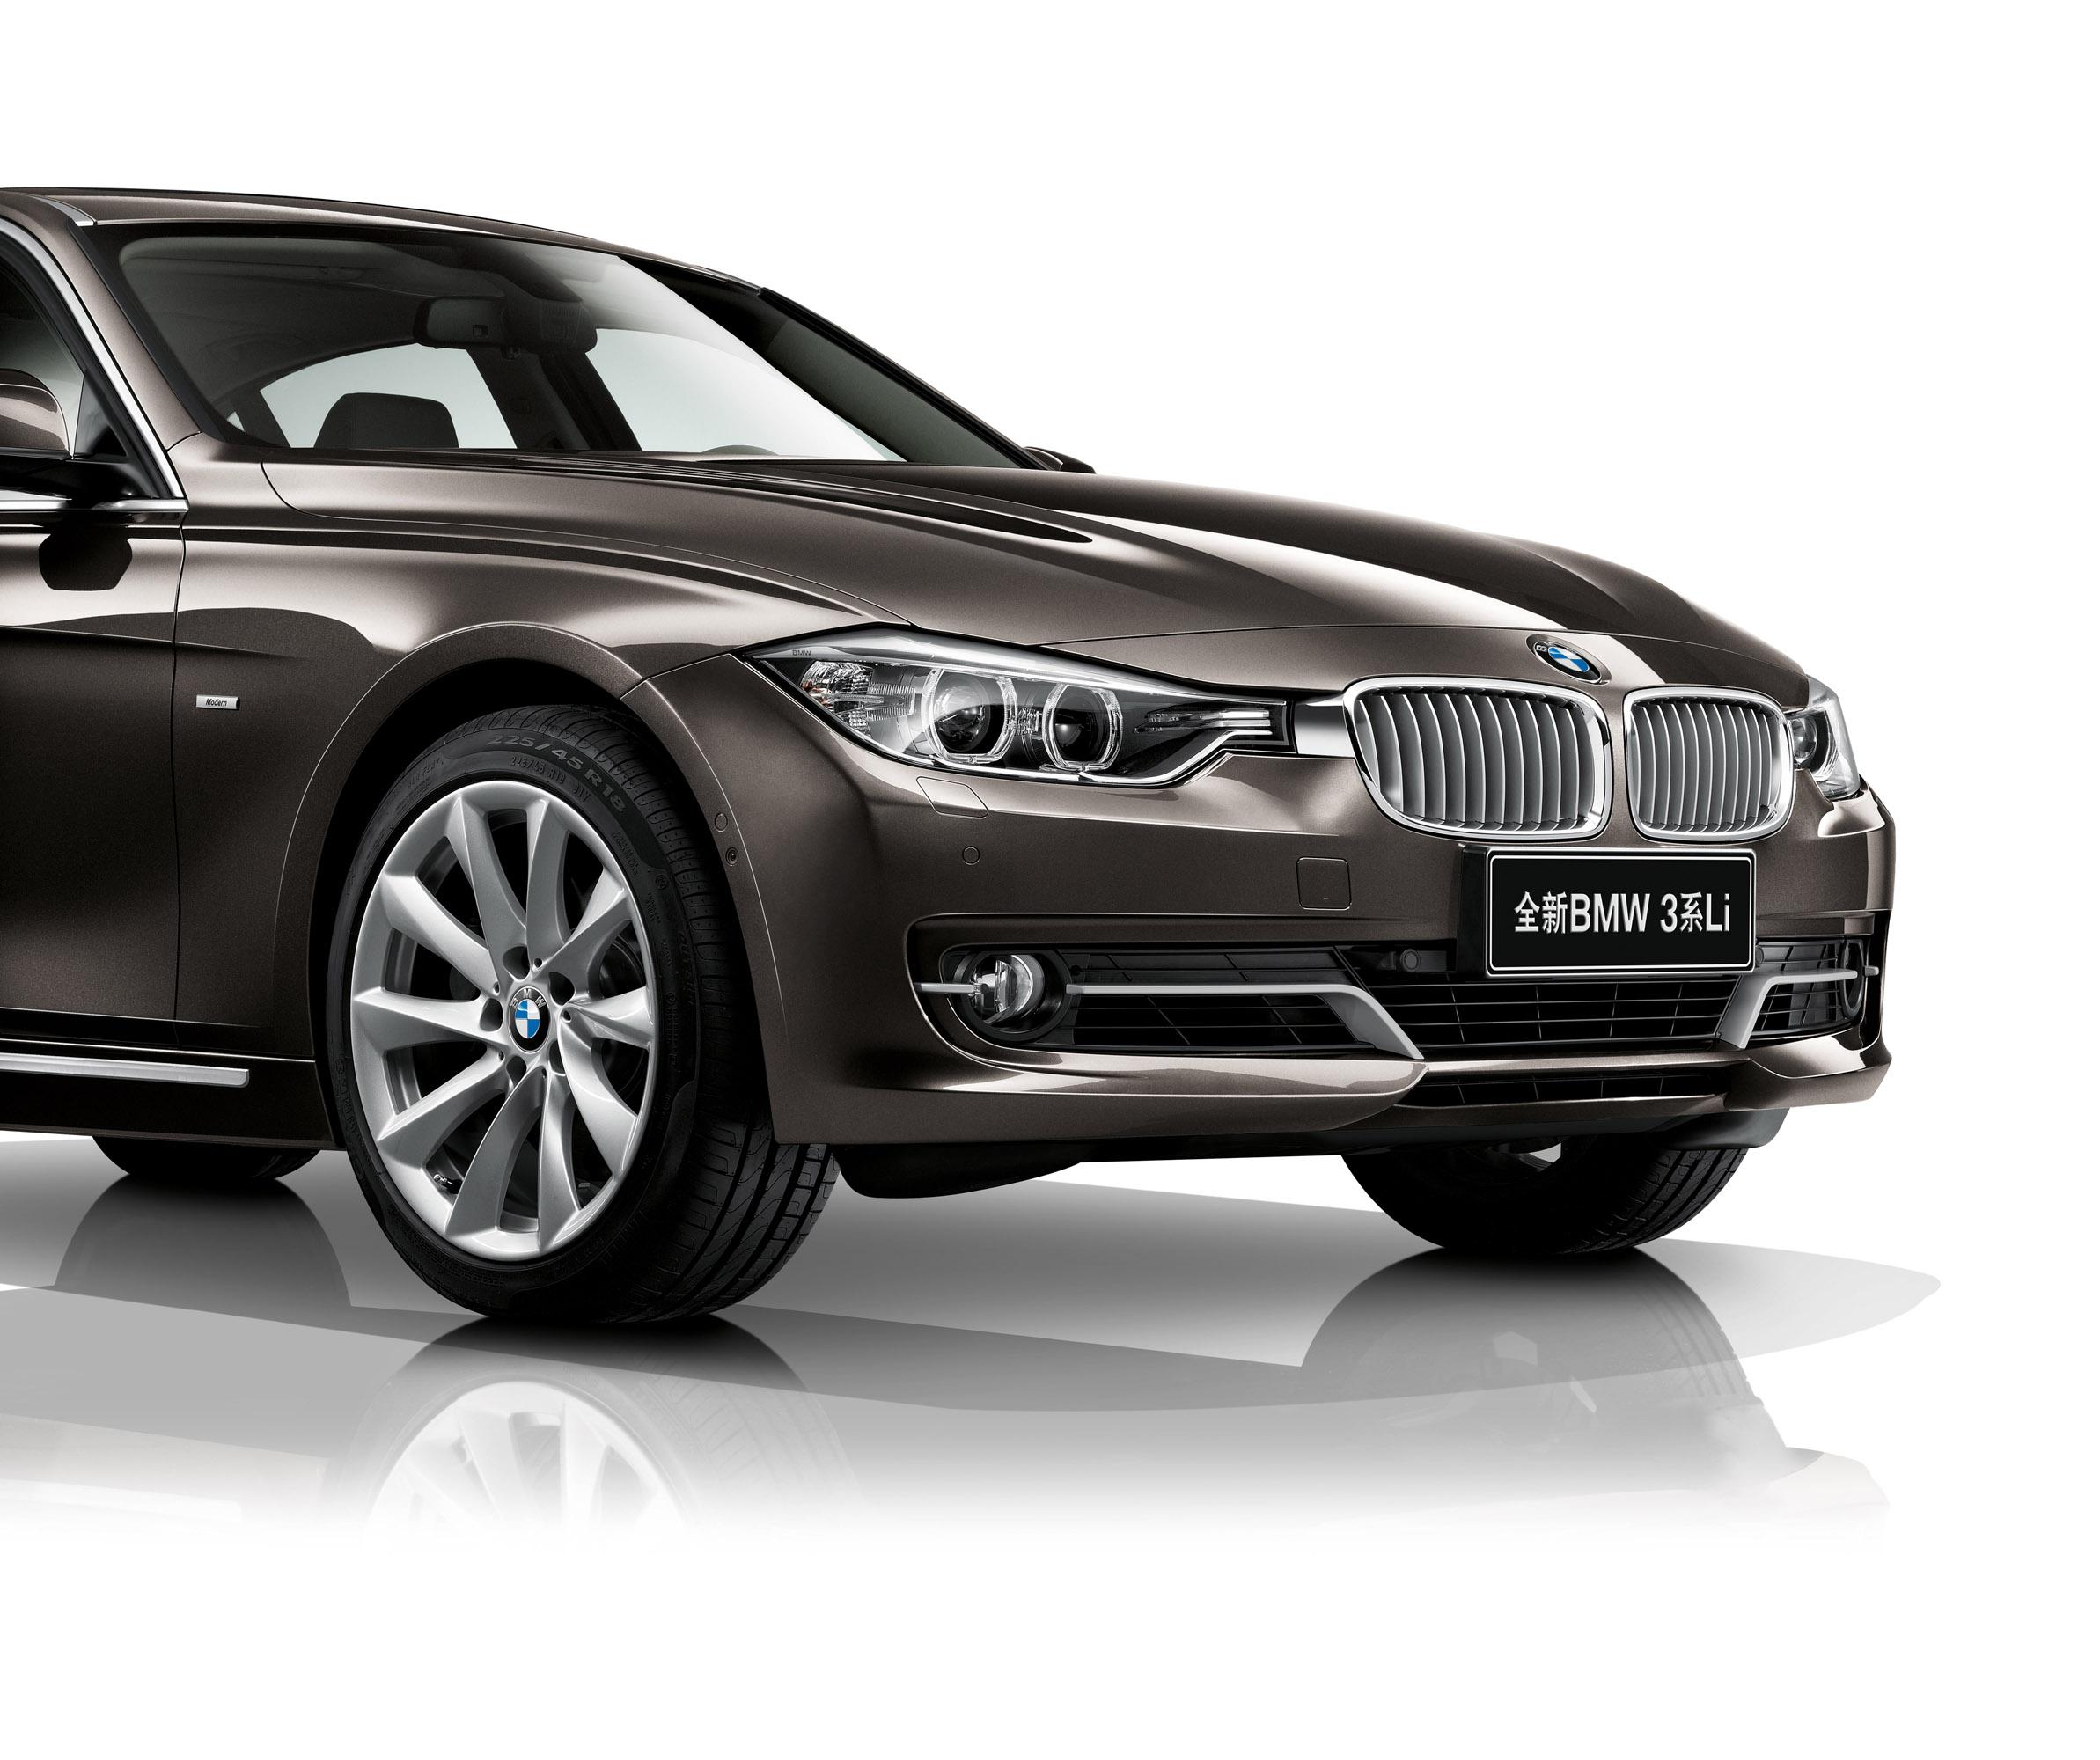 2013 BMW 3-Series Li At Auto China 2012